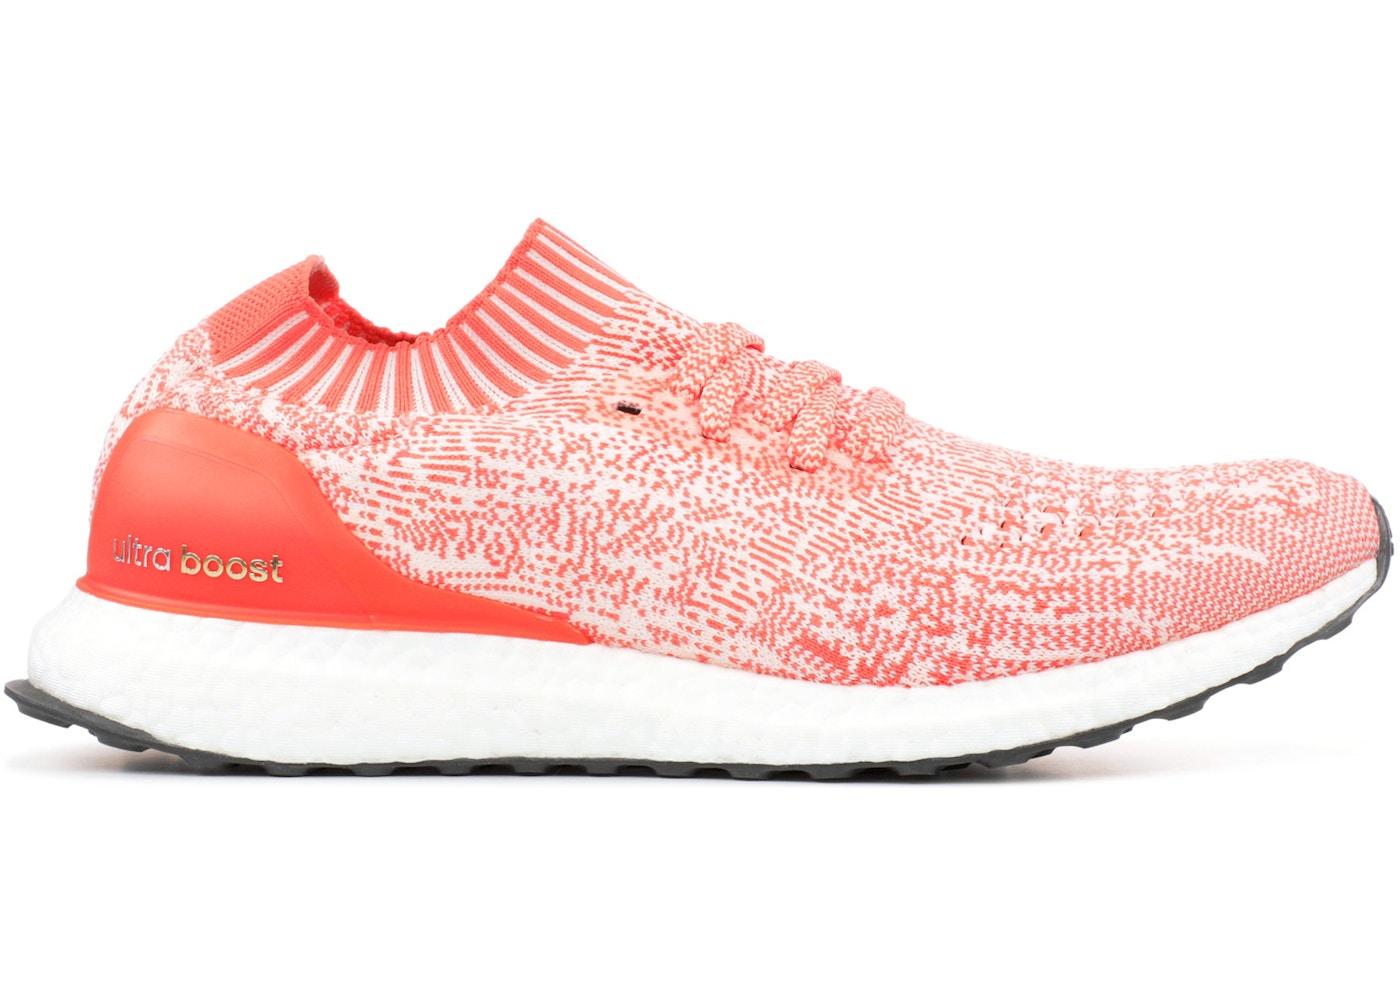 039b79105 adidas Ultra Boost Uncaged Haze Coral (W) - BA7932